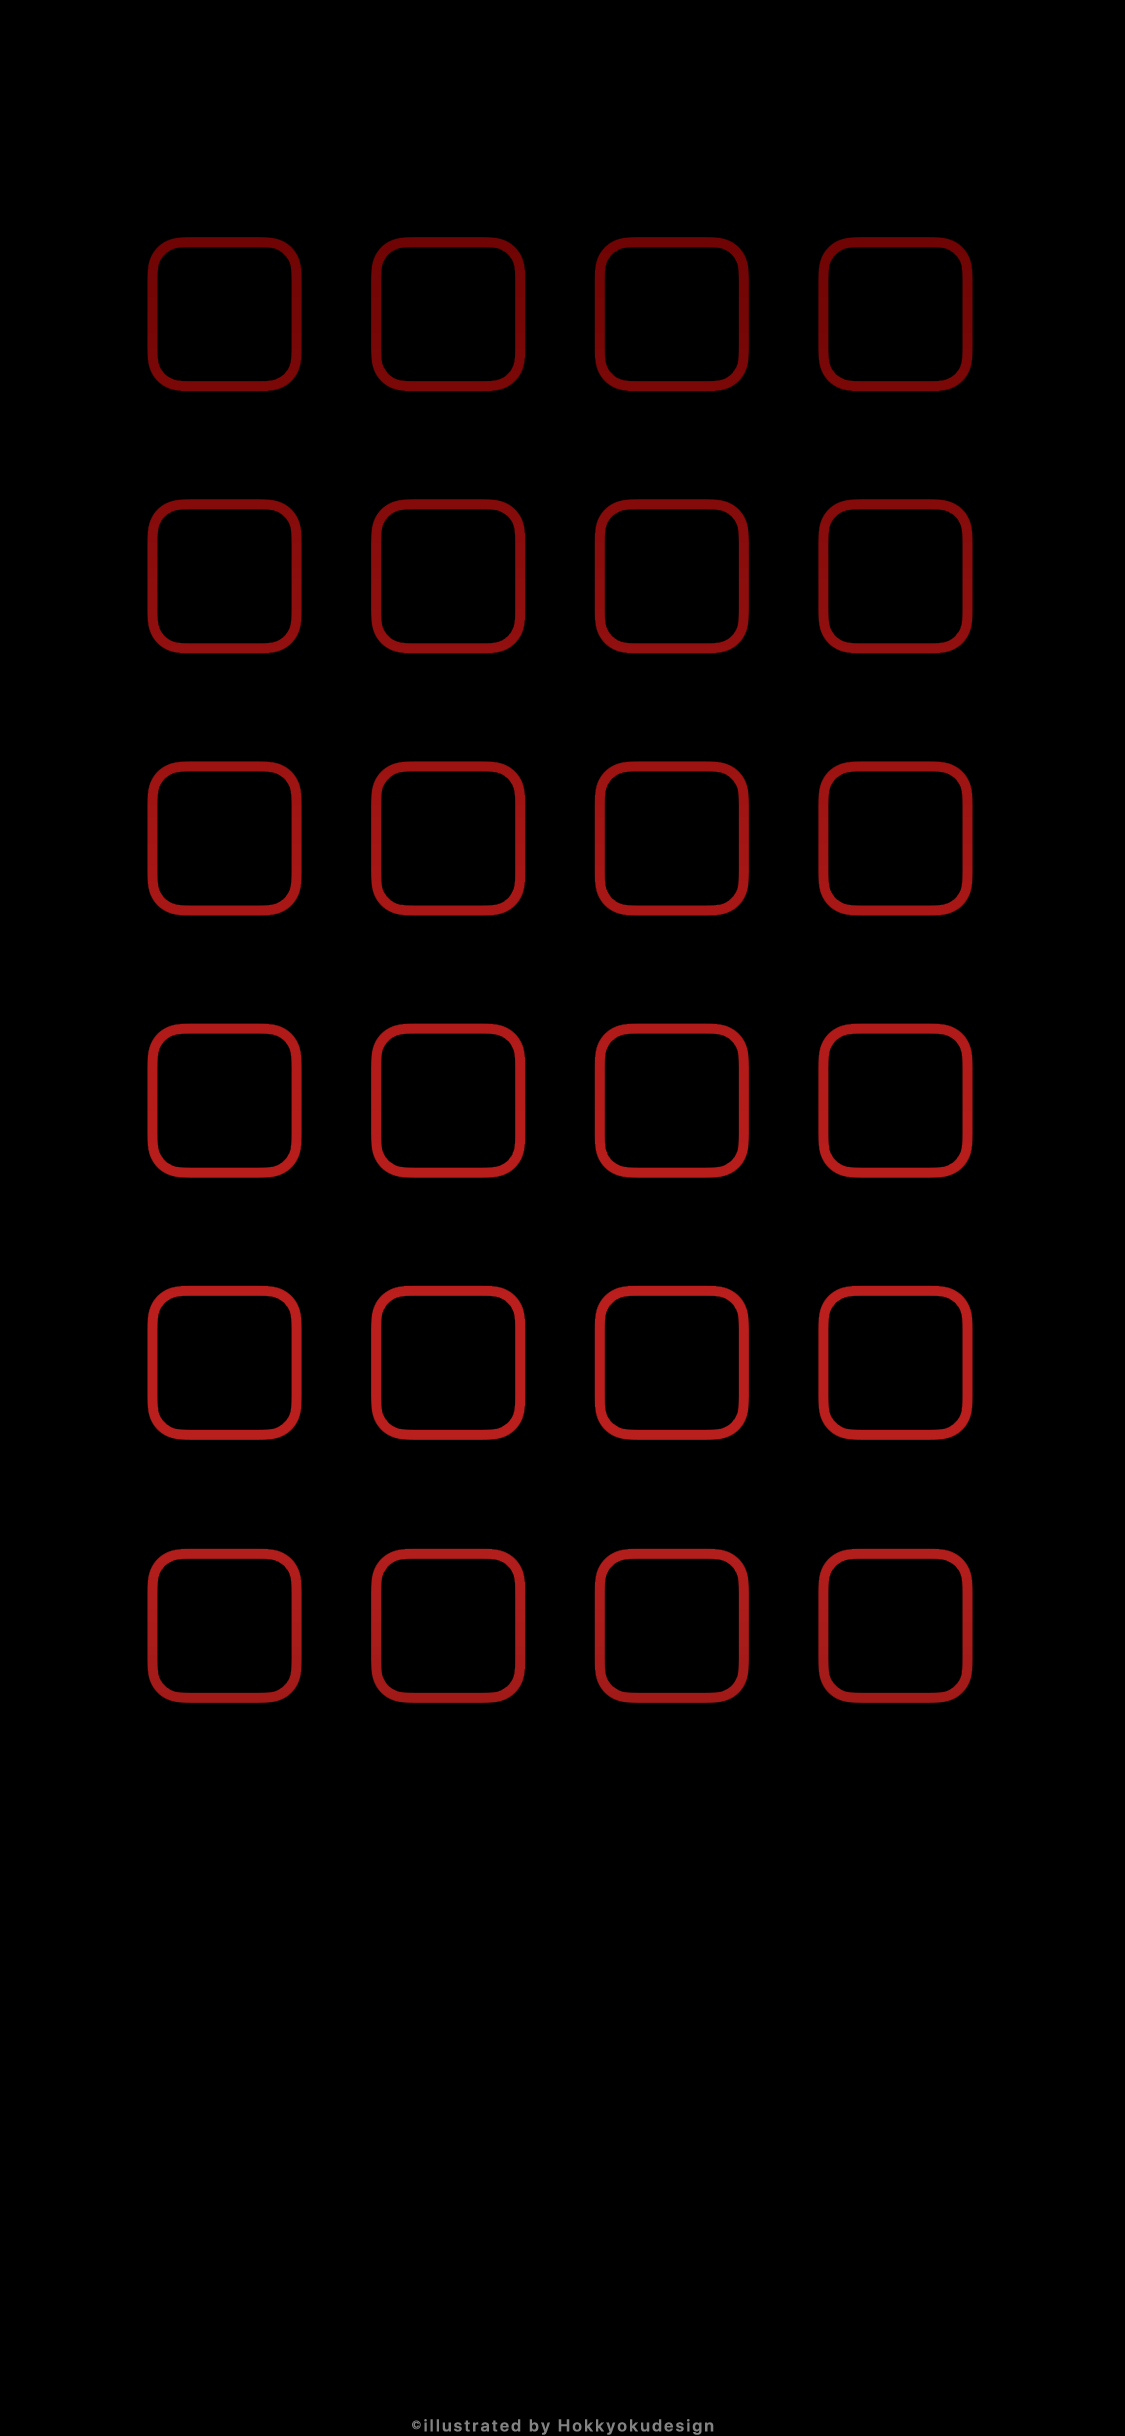 Iphonexの動く壁紙 有機el液晶用黒地に赤枠 Iphone X 壁紙 壁紙 赤 黒の壁紙